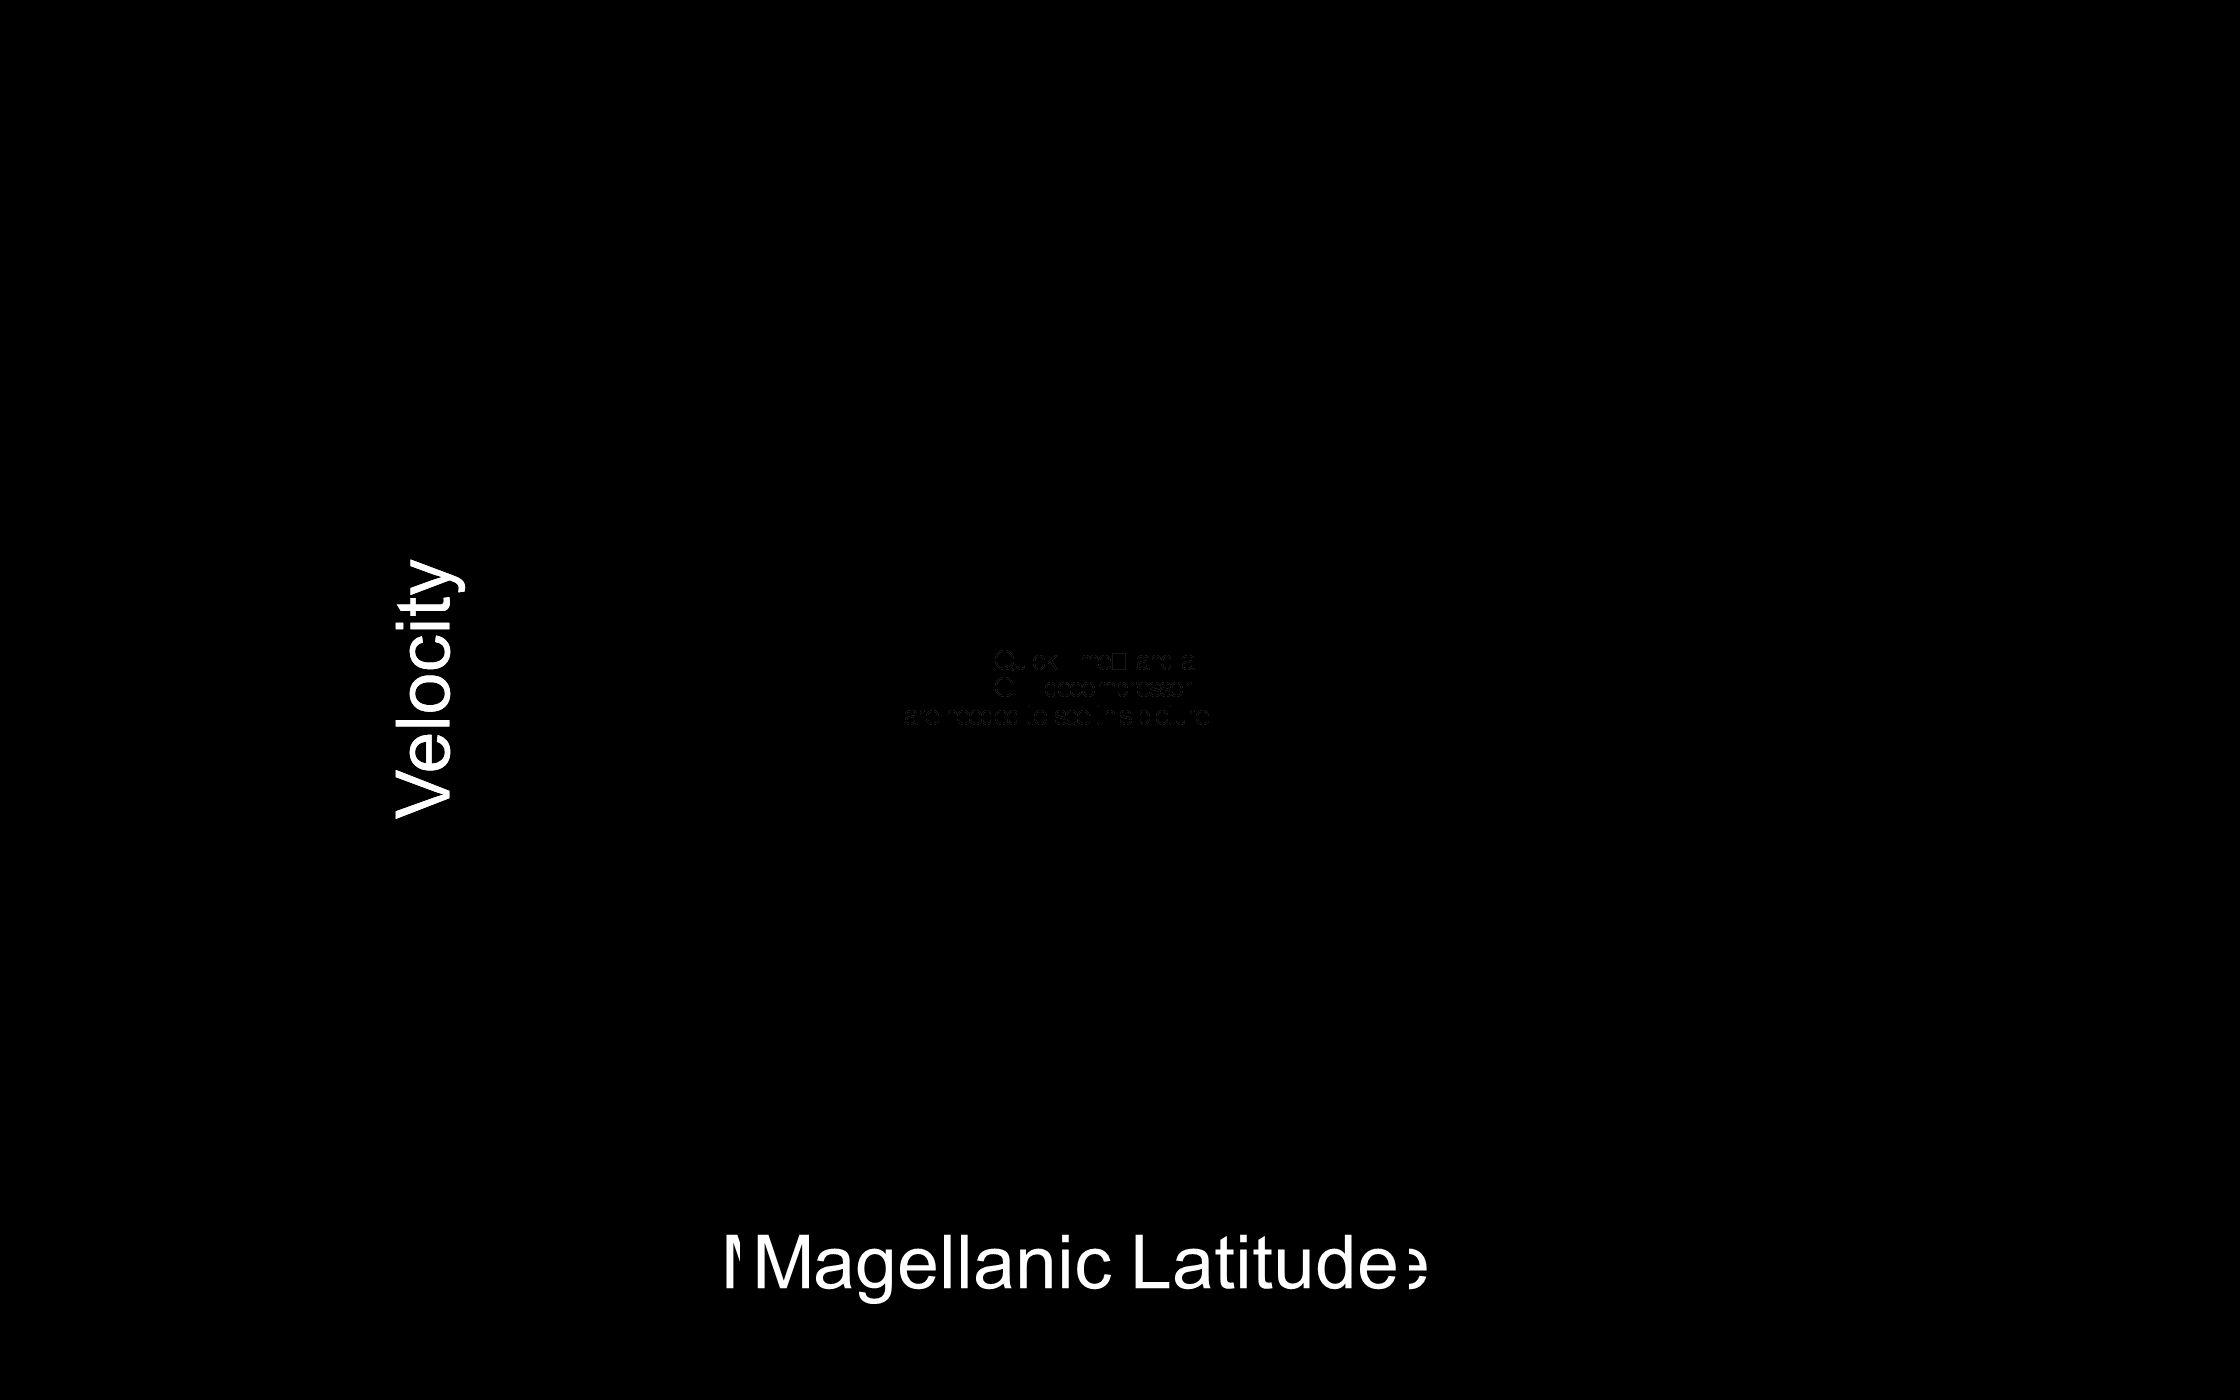 Magellanic Longitude Velocity Magellanic Latitude